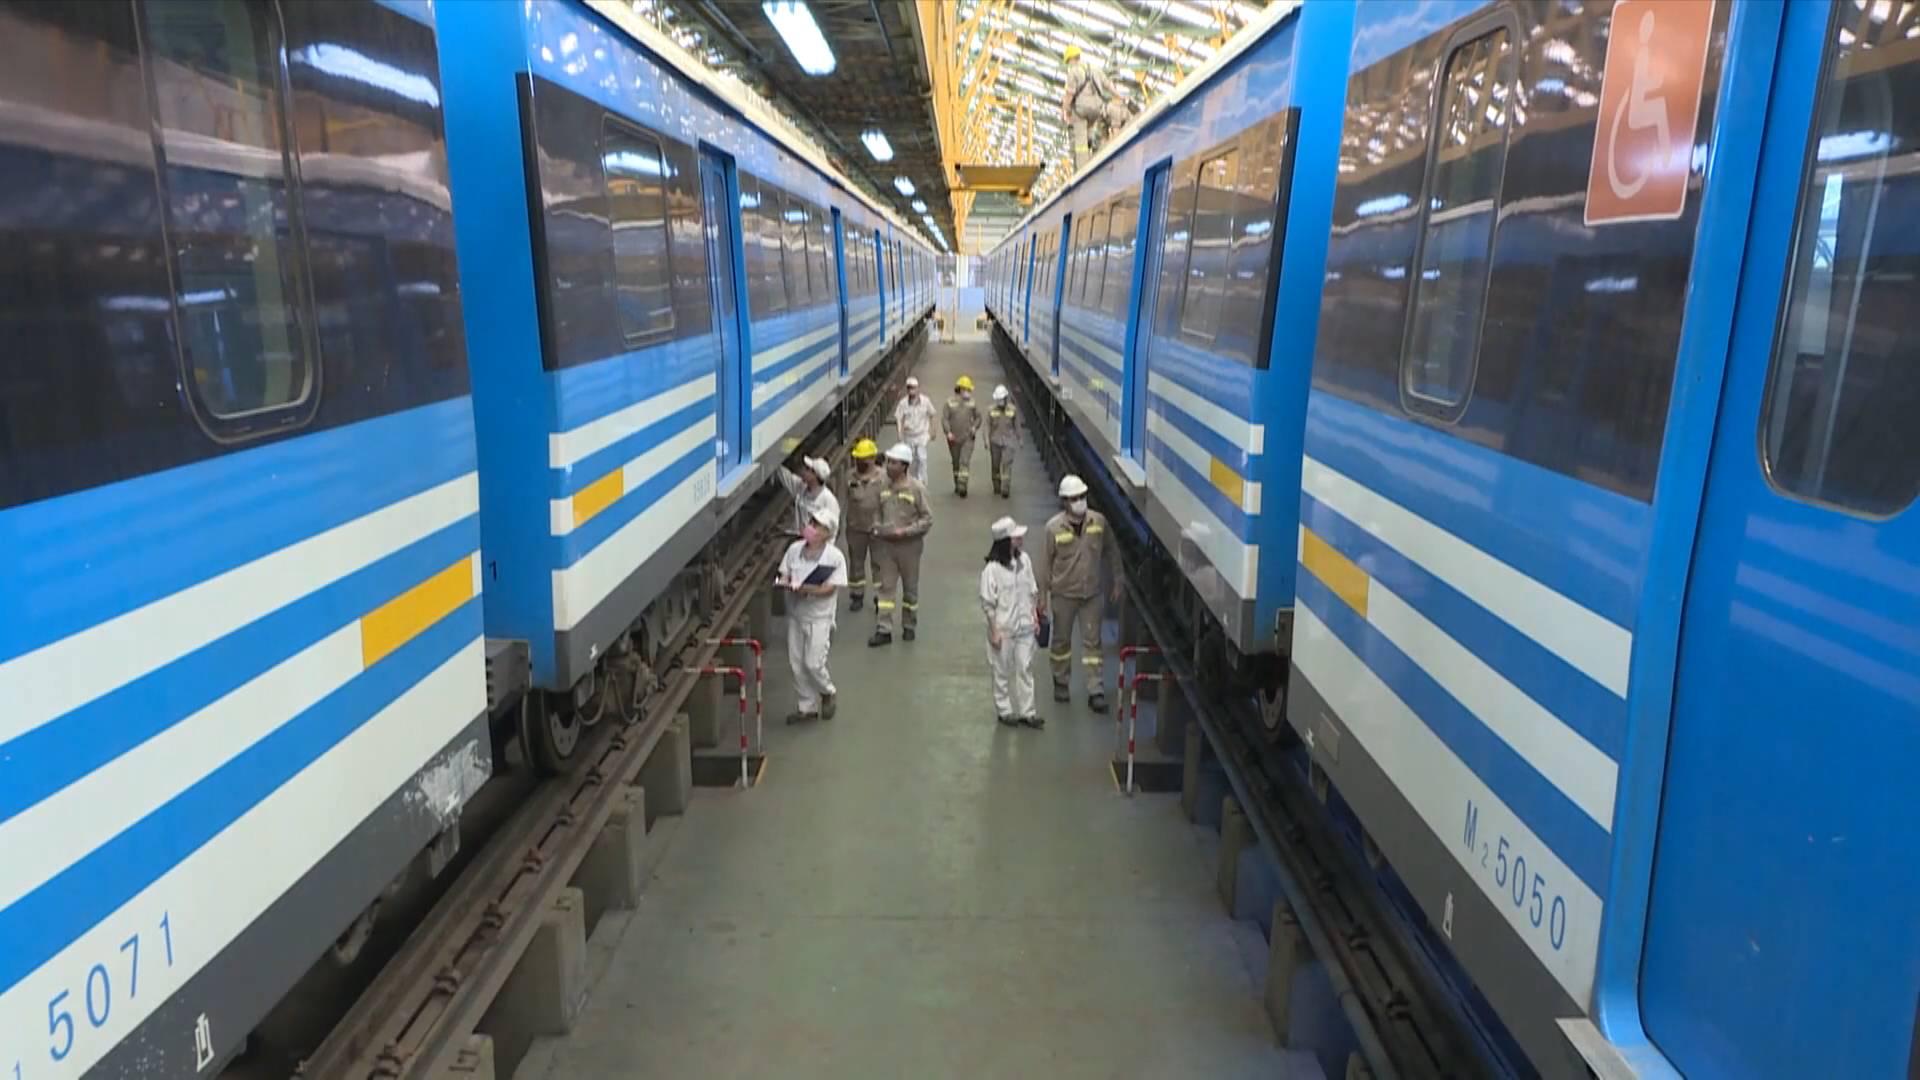 China-Argentina cooperation guarantees smooth rail services amid pandemic